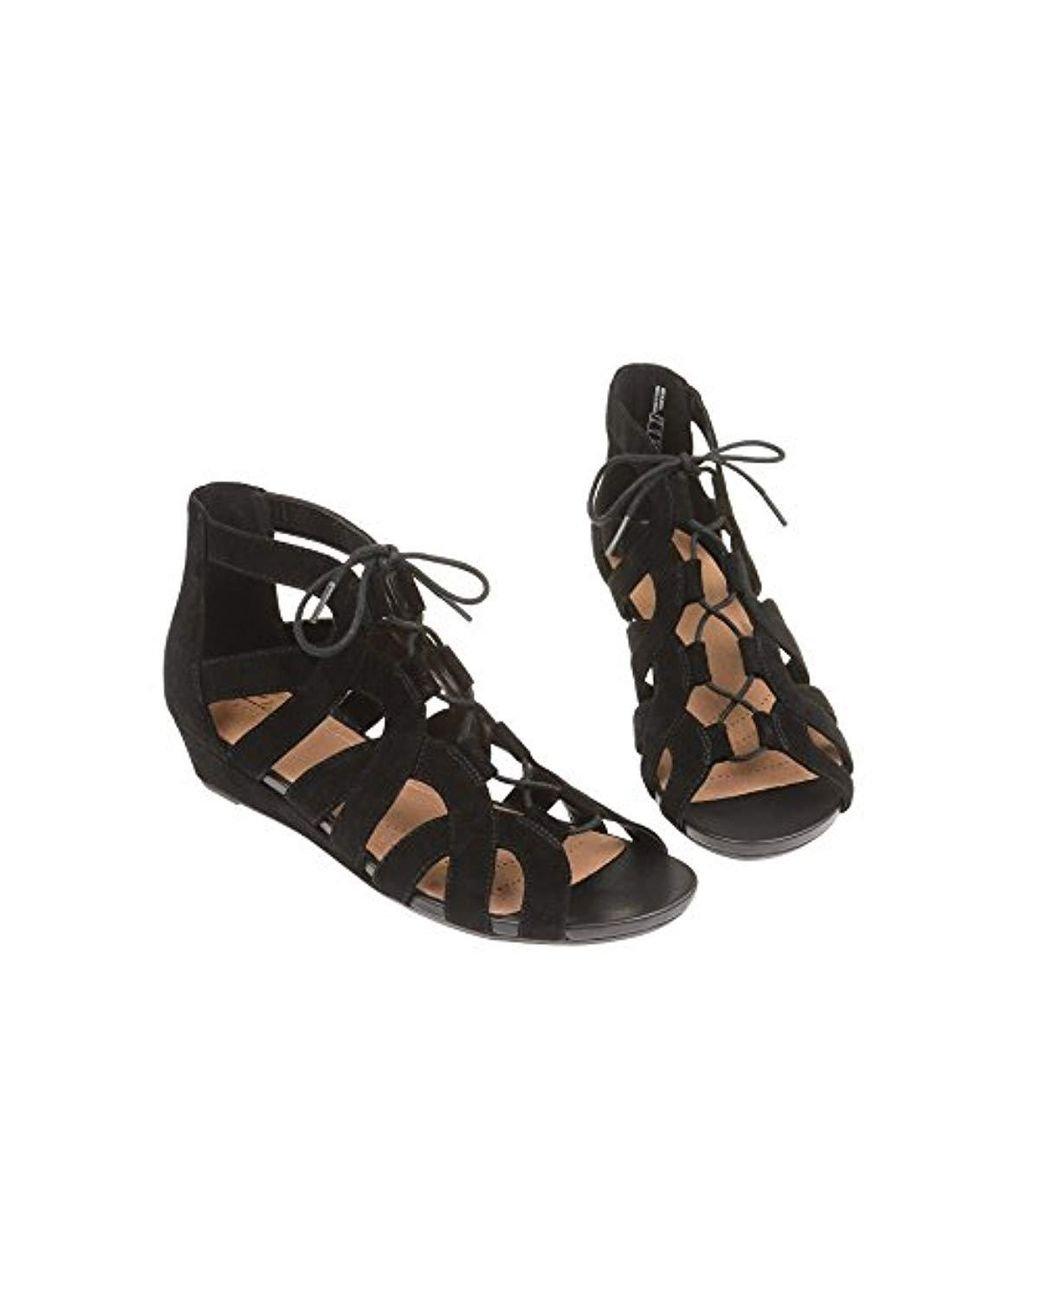 1918ba8d528 Clarks Sandals Smart Parram Lux Suede In Standard in Black - Lyst